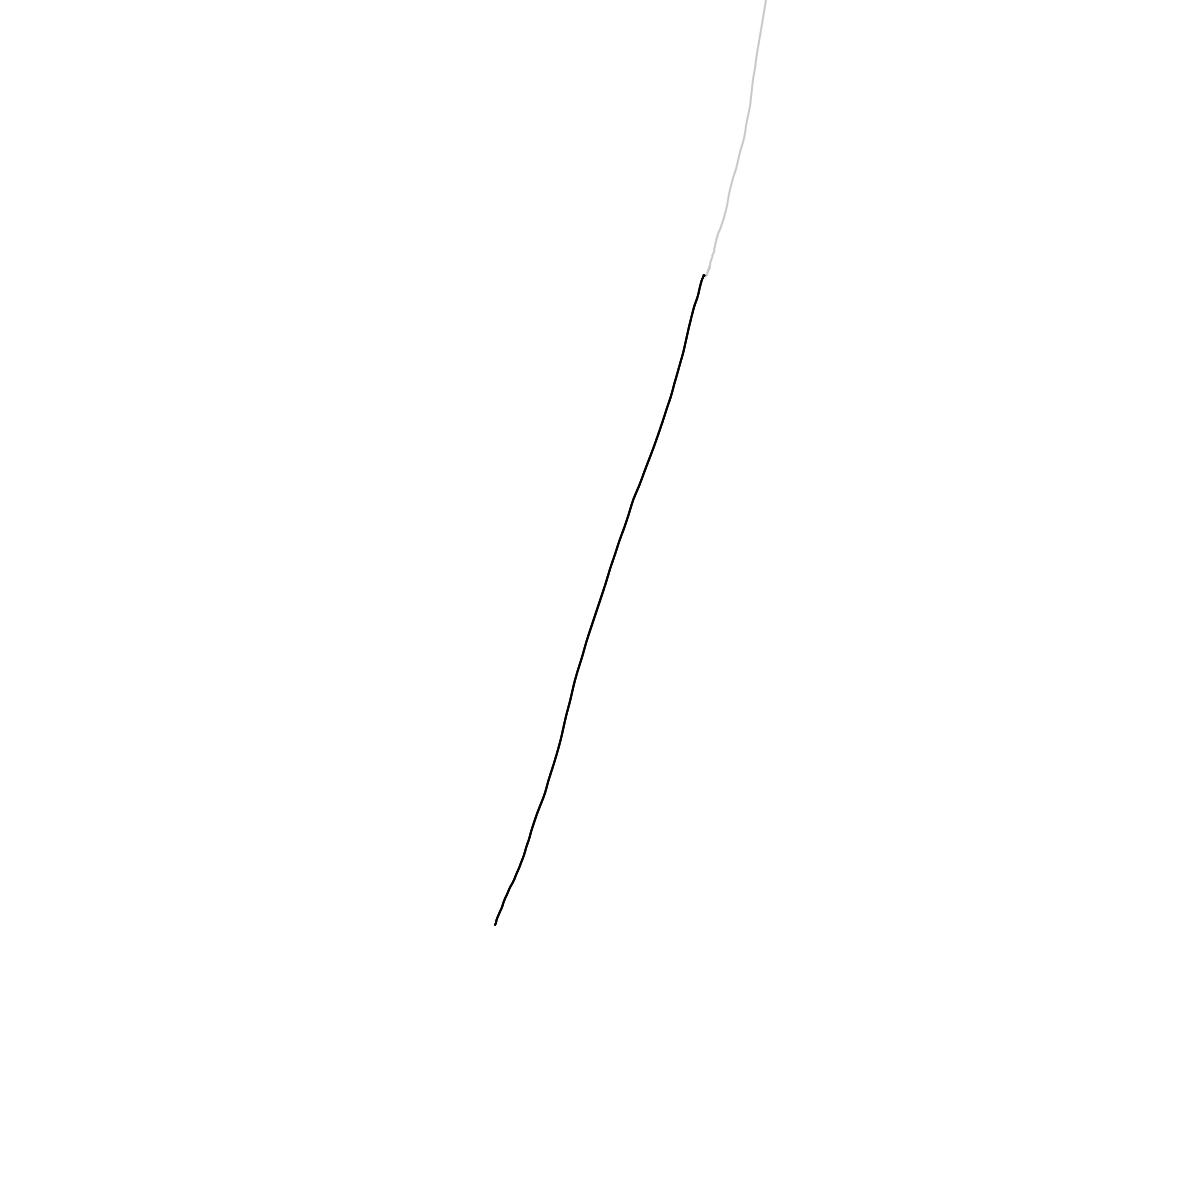 BAAAM drawing#18083 lat:40.7131195068359400lng: -74.0121154785156200